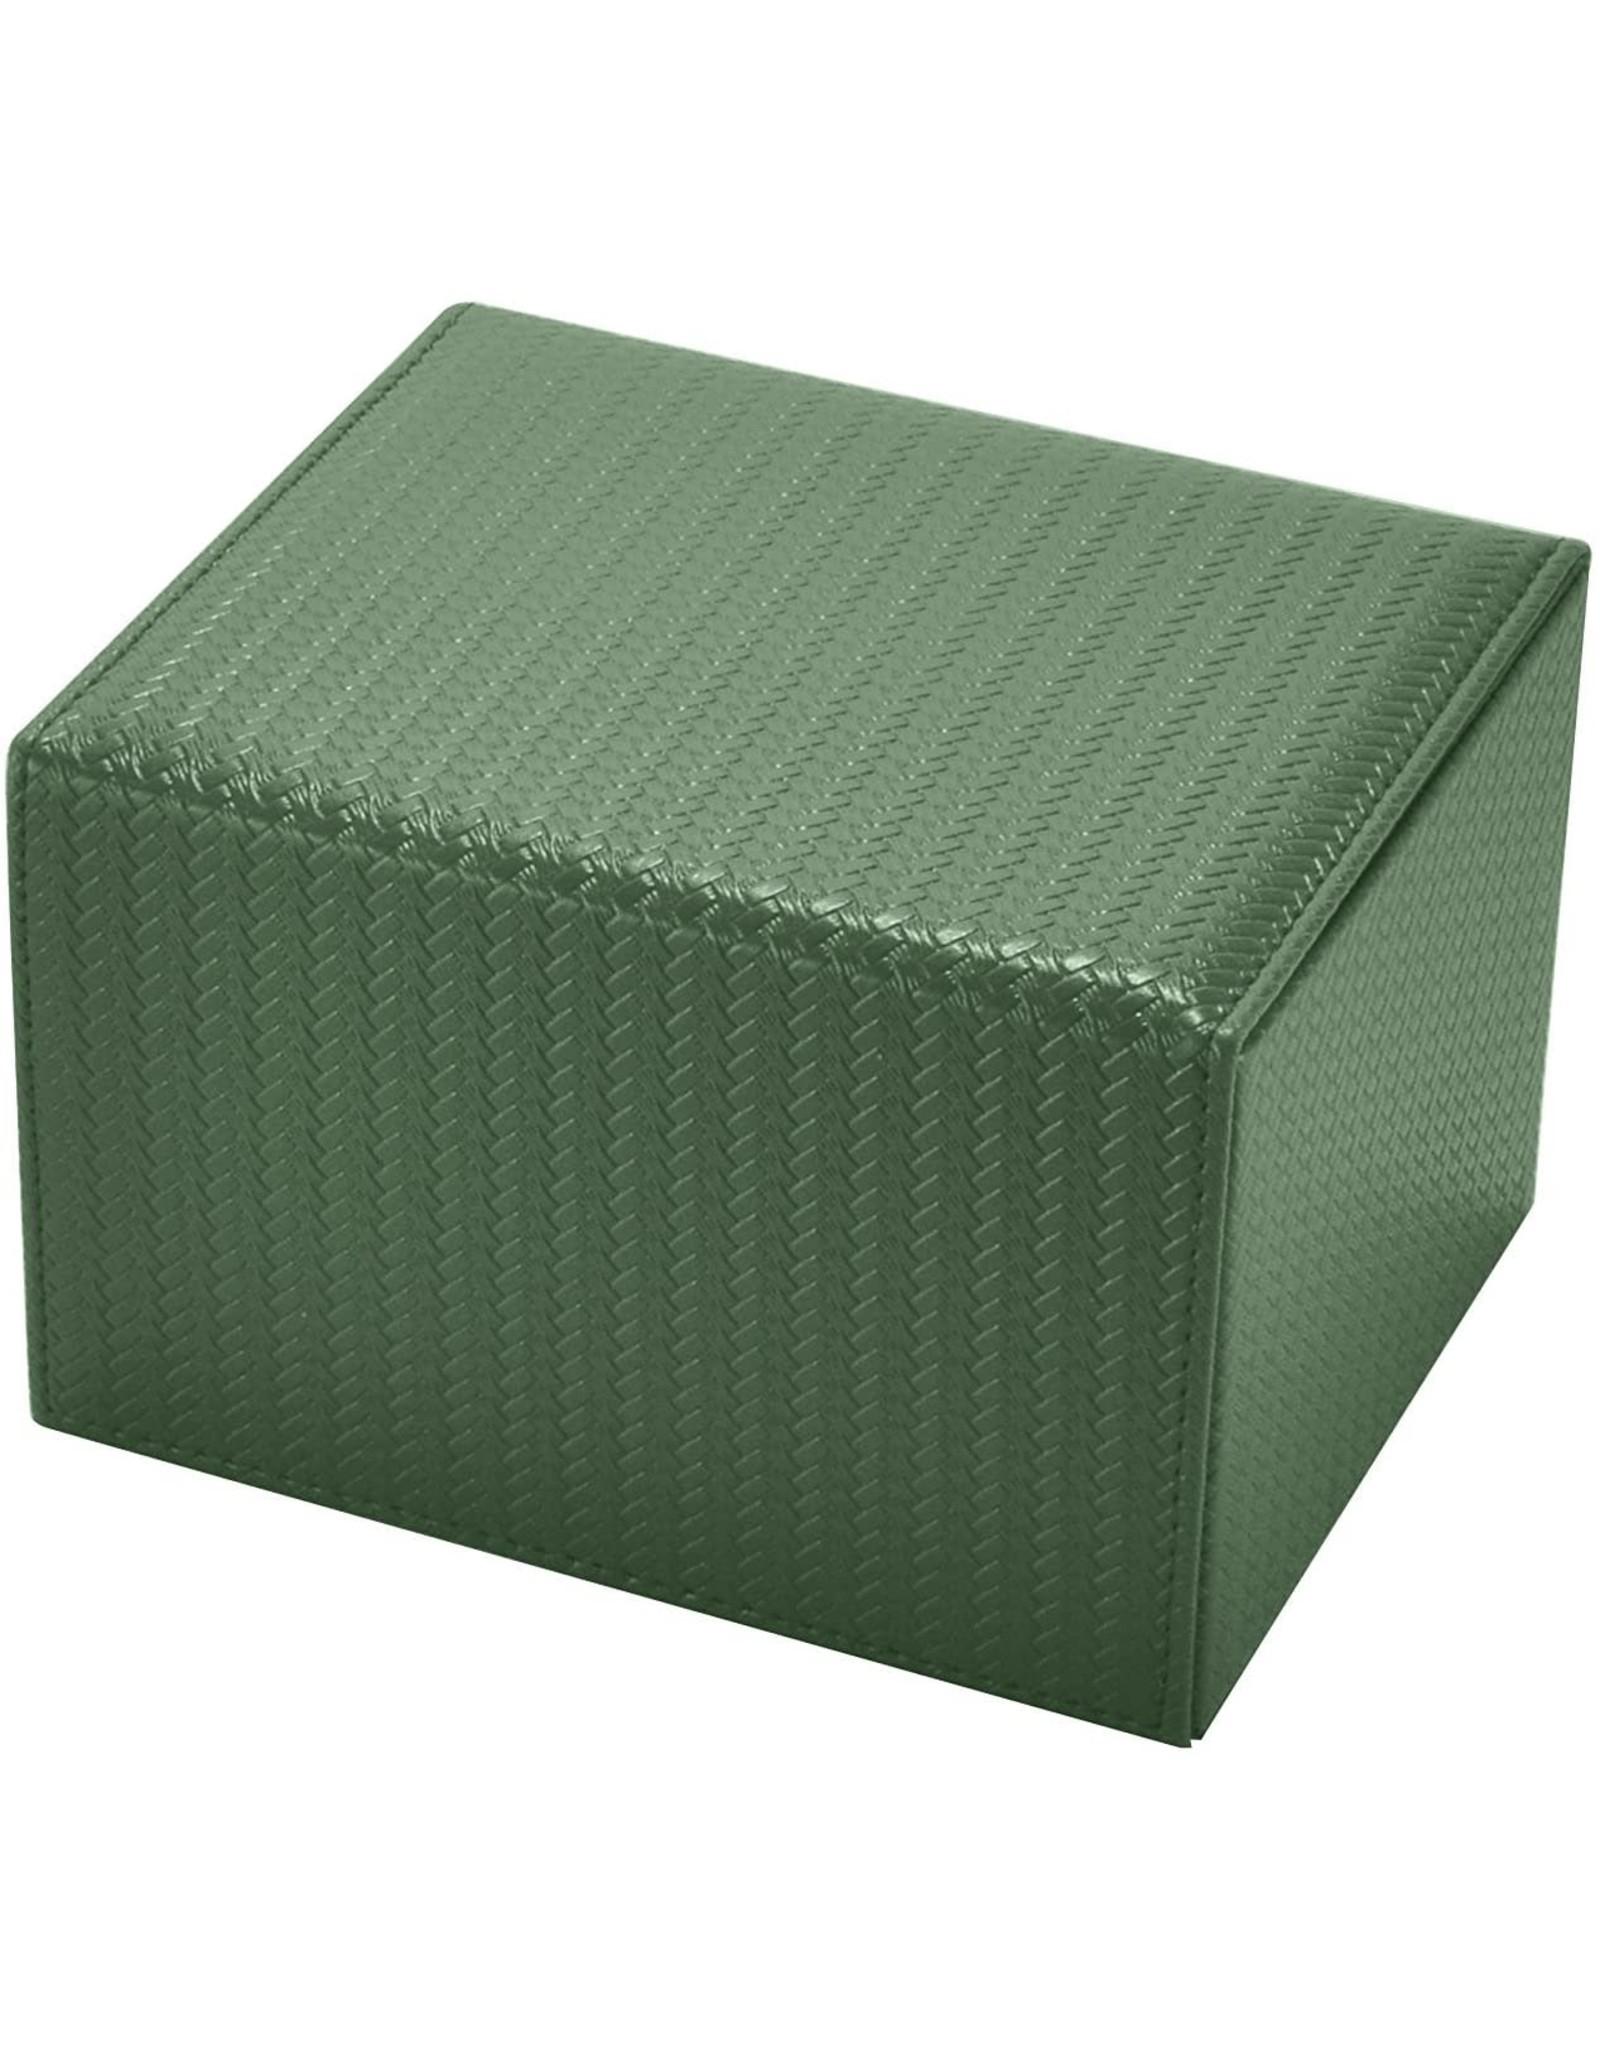 Dex Protection Dex Proline Large Green 100ct